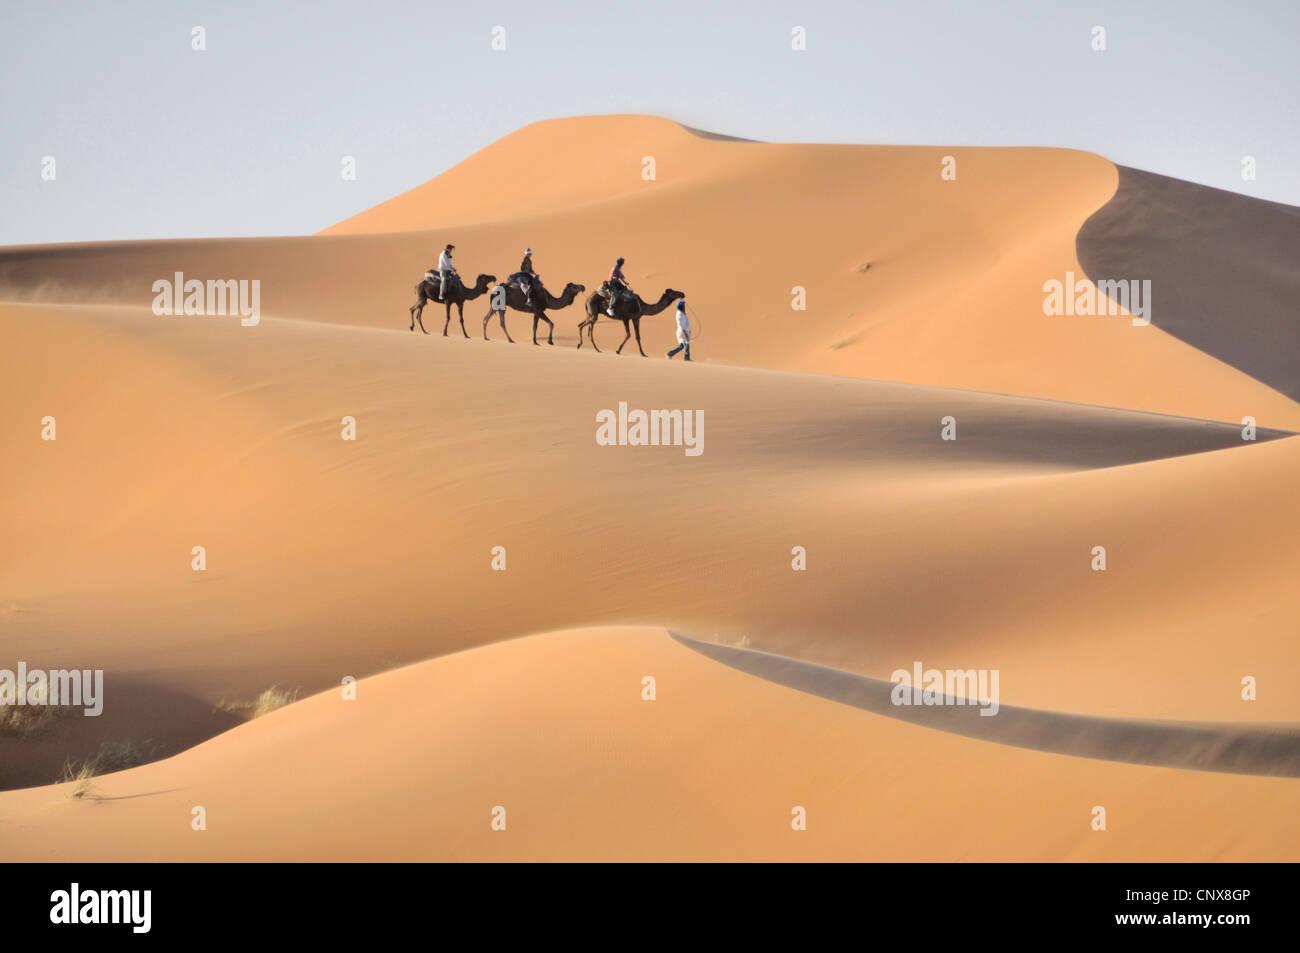 dromedary, one-humped camel (Camelus dromedarius), caravan in Erg Chebbi, Morocco, Maghreb Stock Photo